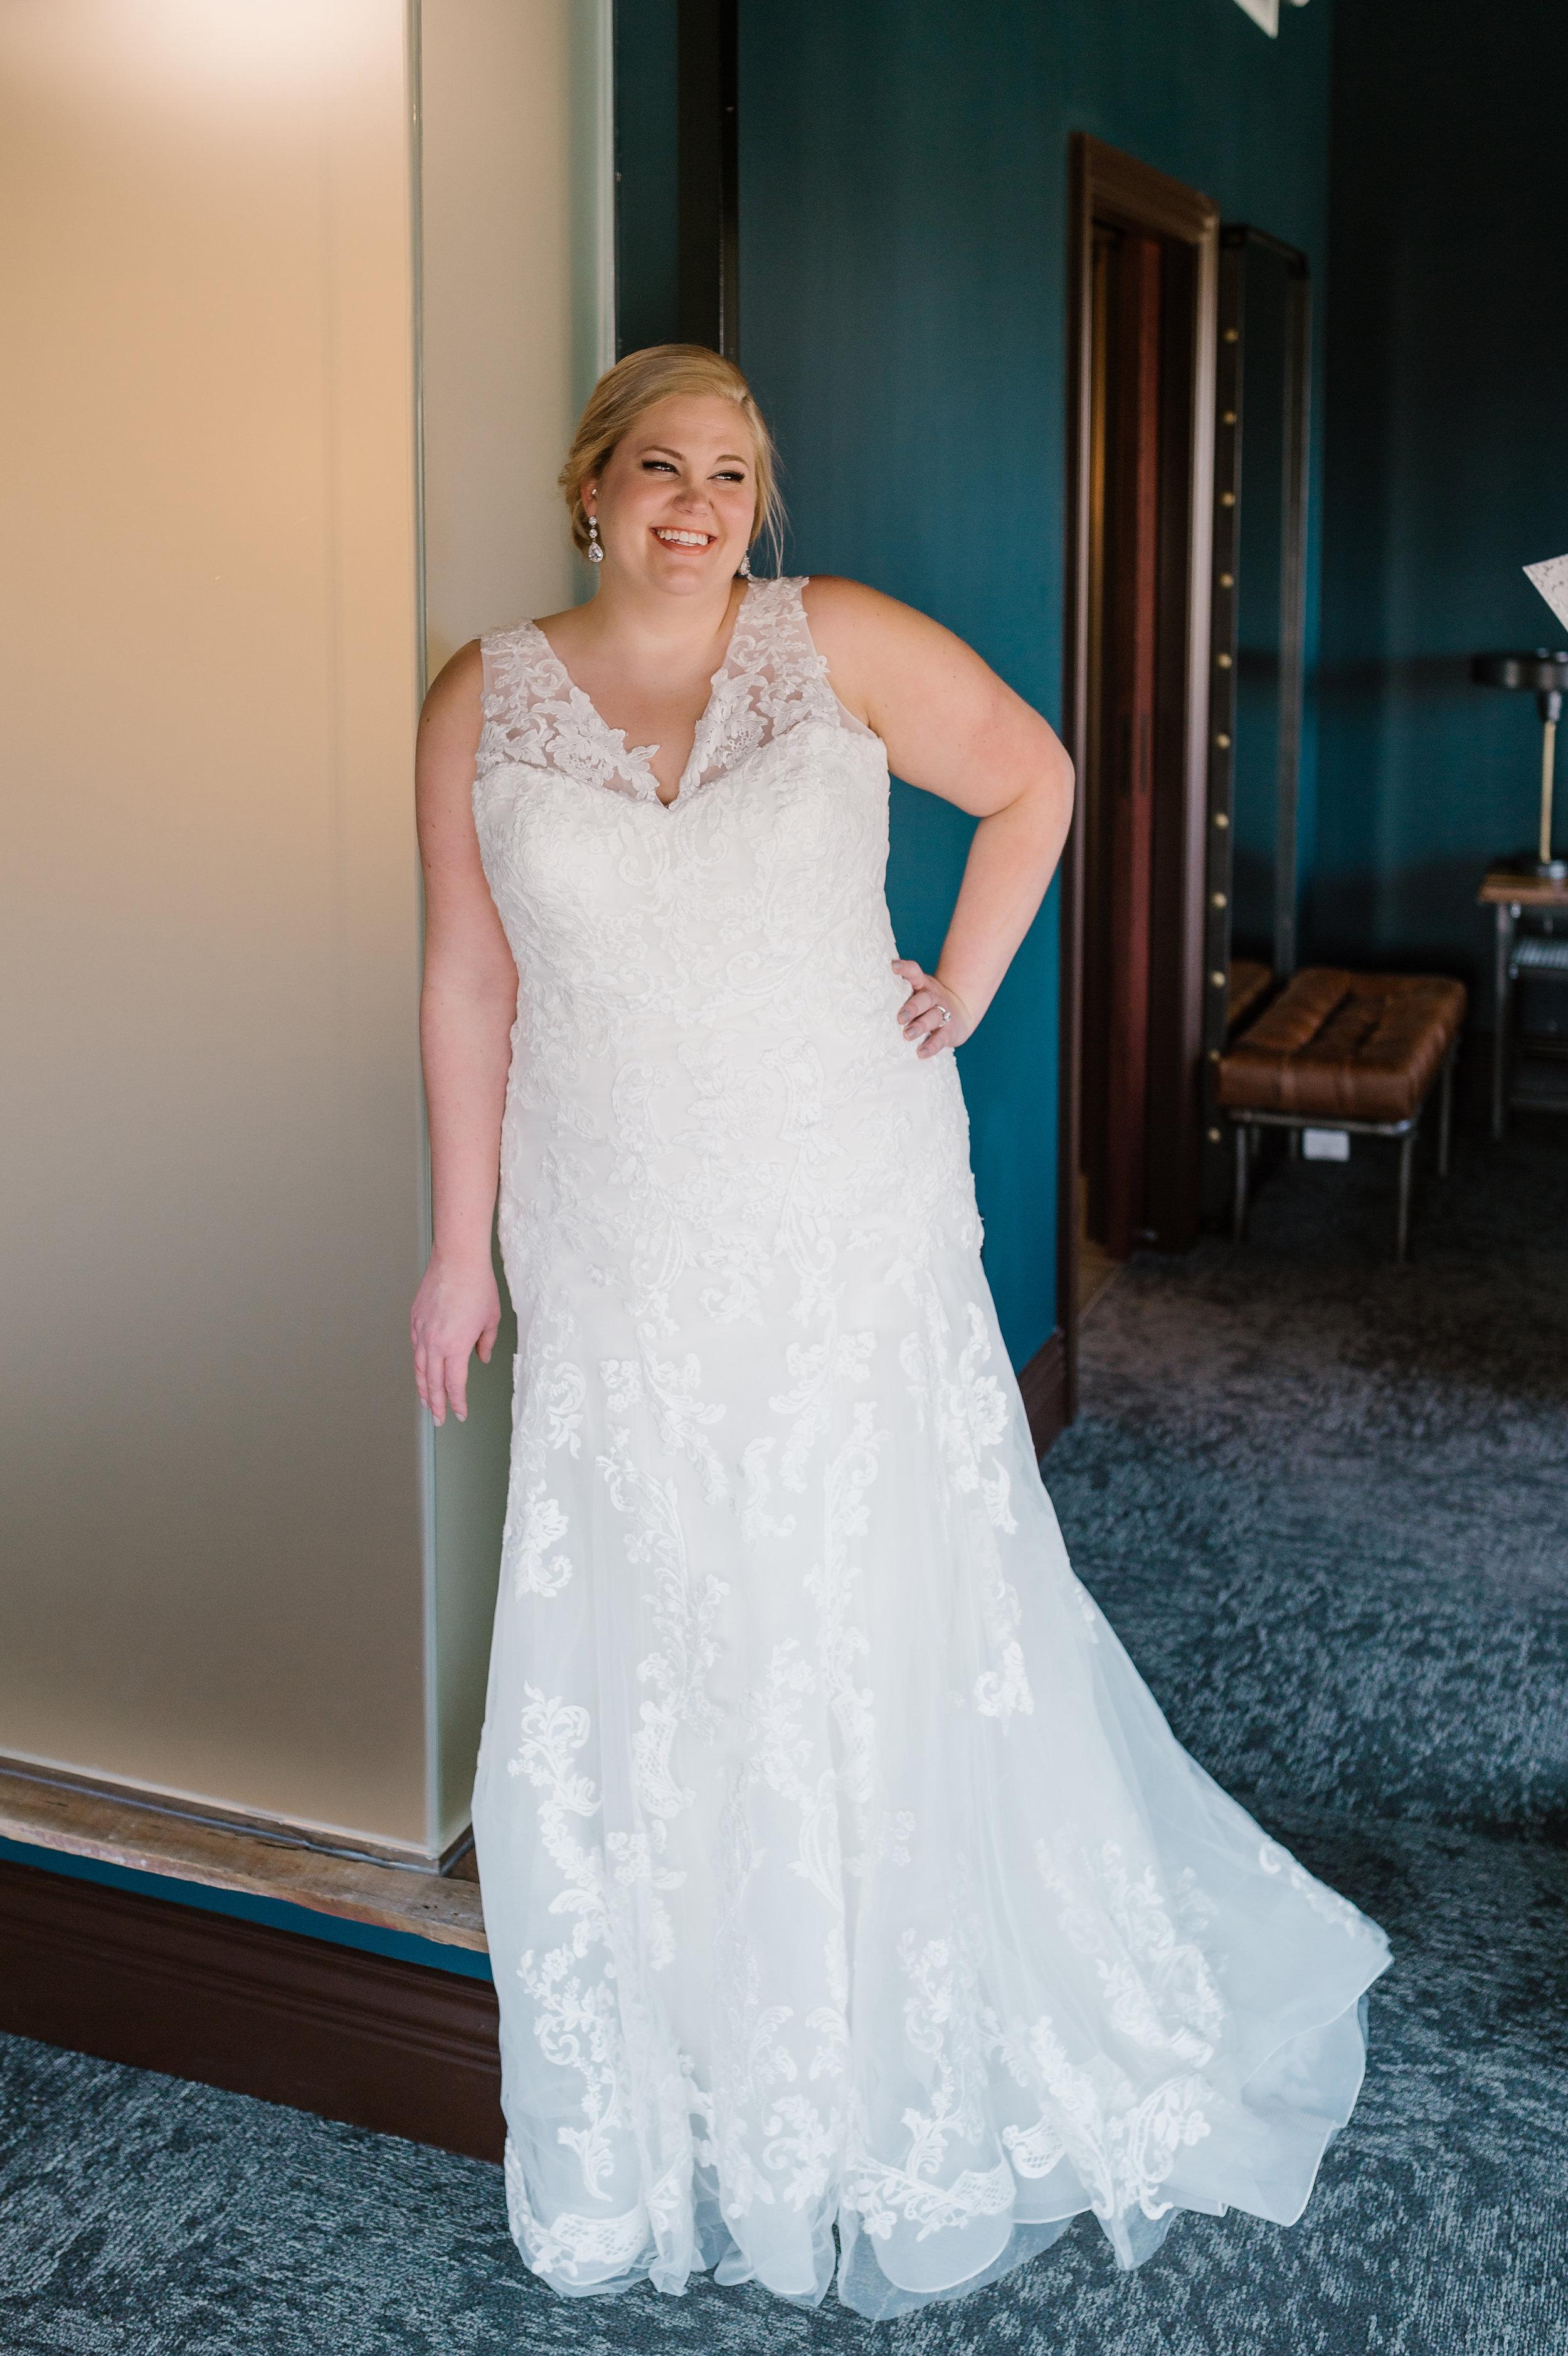 BridesbyYoung-IndianapolisIndianaSchaumburgChicagoIllinois-CurvyPlusSizeBridalStore-PrivateCollection-16.JPG